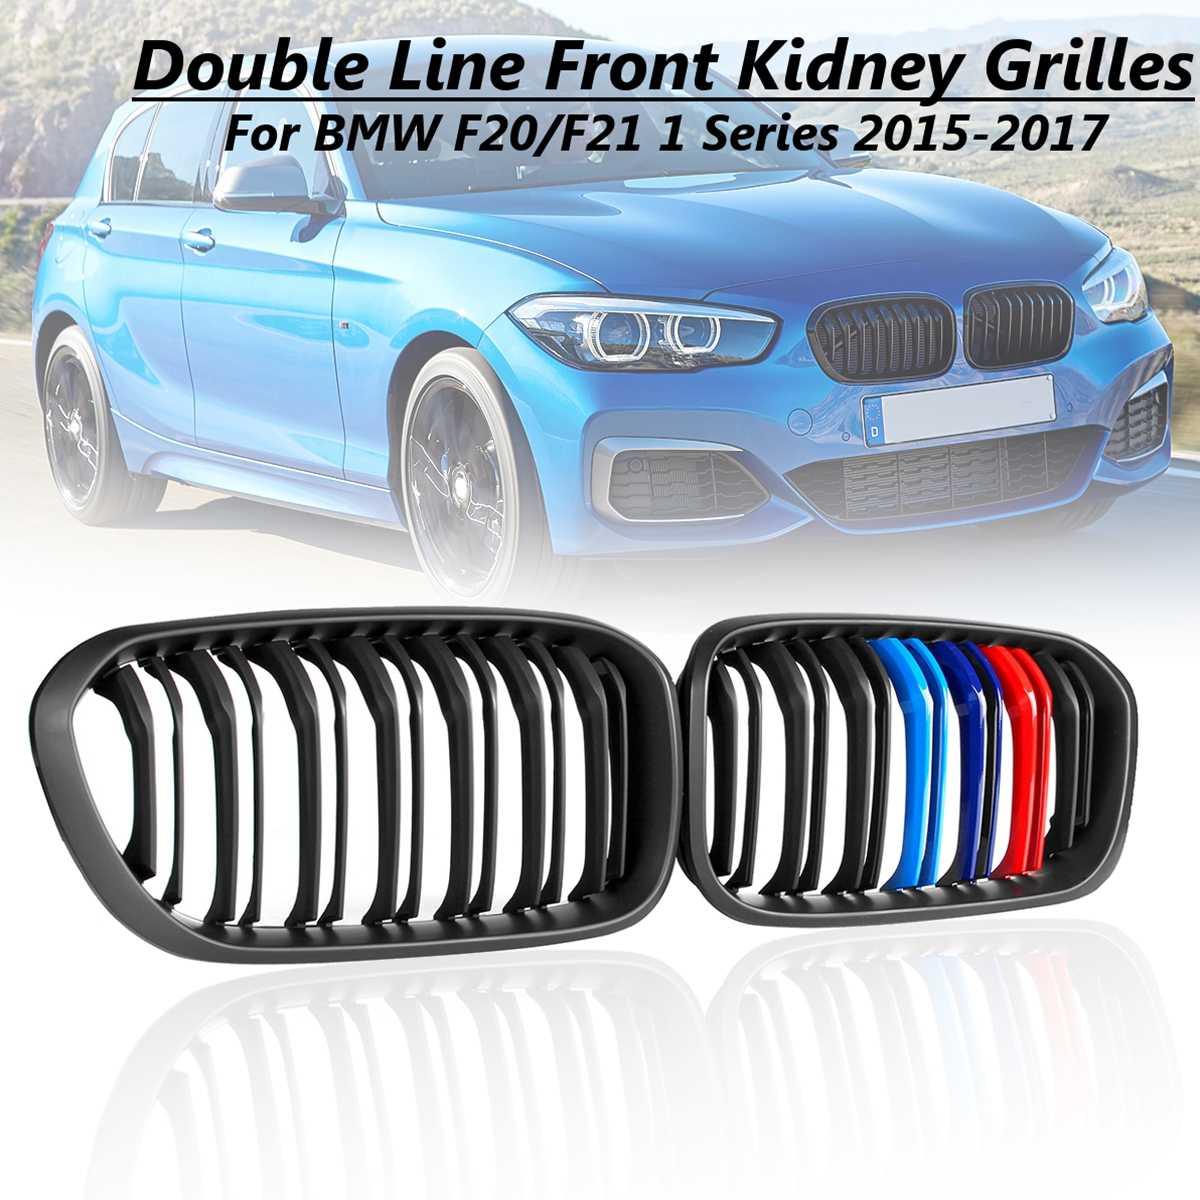 1 Series 2015 2016 2017 Kidney Grilles Matte Kidney Grilles for BMW F20 F21 Black M-Color Twin Bar Car Front Bumper Grille1 Series 2015 2016 2017 Kidney Grilles Matte Kidney Grilles for BMW F20 F21 Black M-Color Twin Bar Car Front Bumper Grille